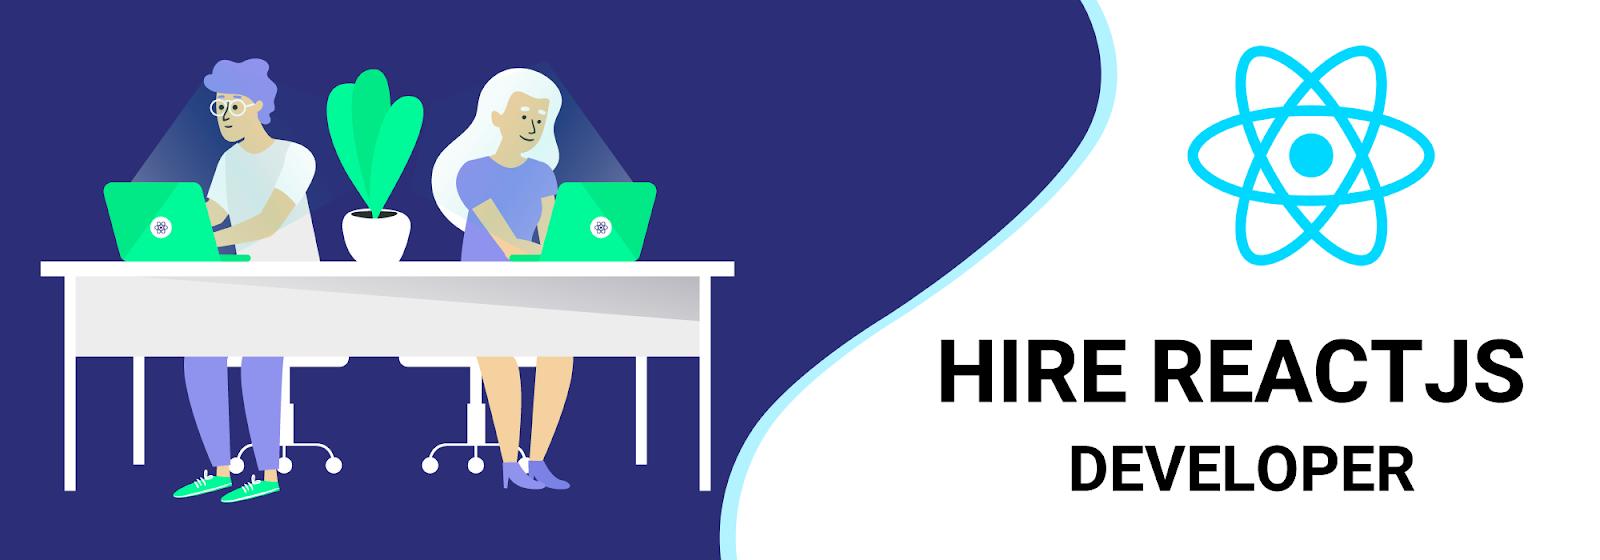 React Developer Job Description Template -